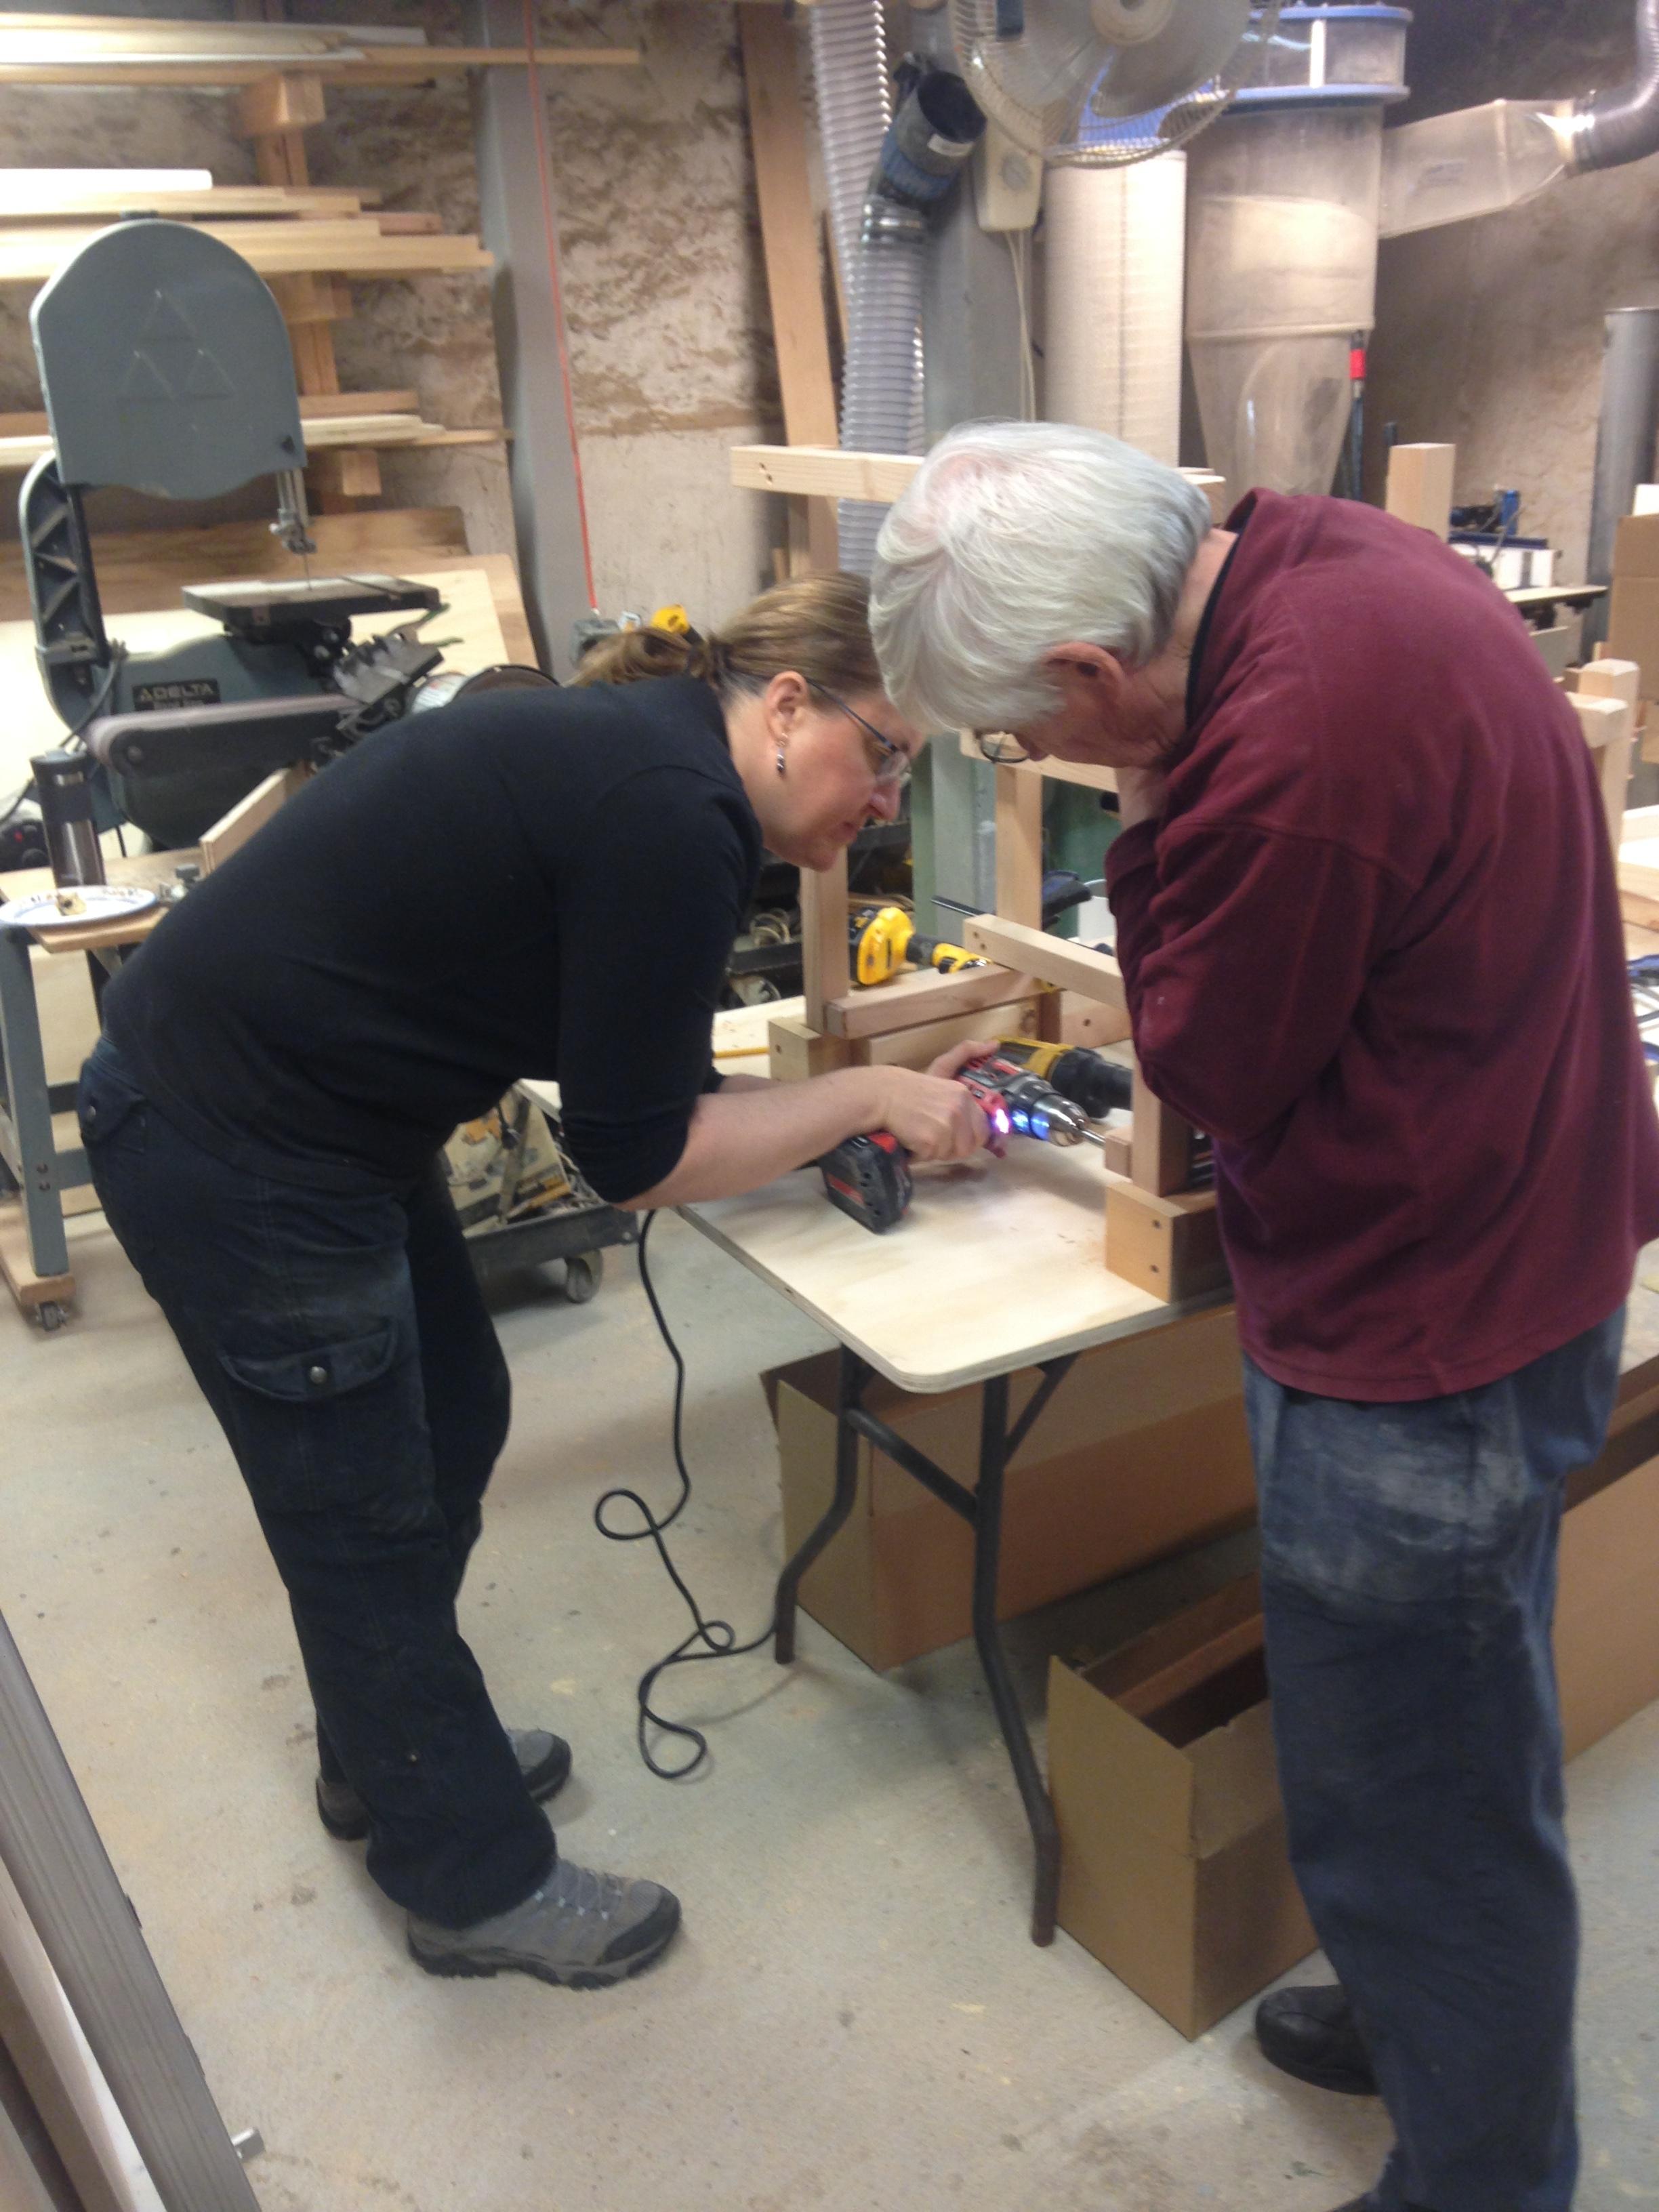 Frank Perrone Wave Hill Workshop